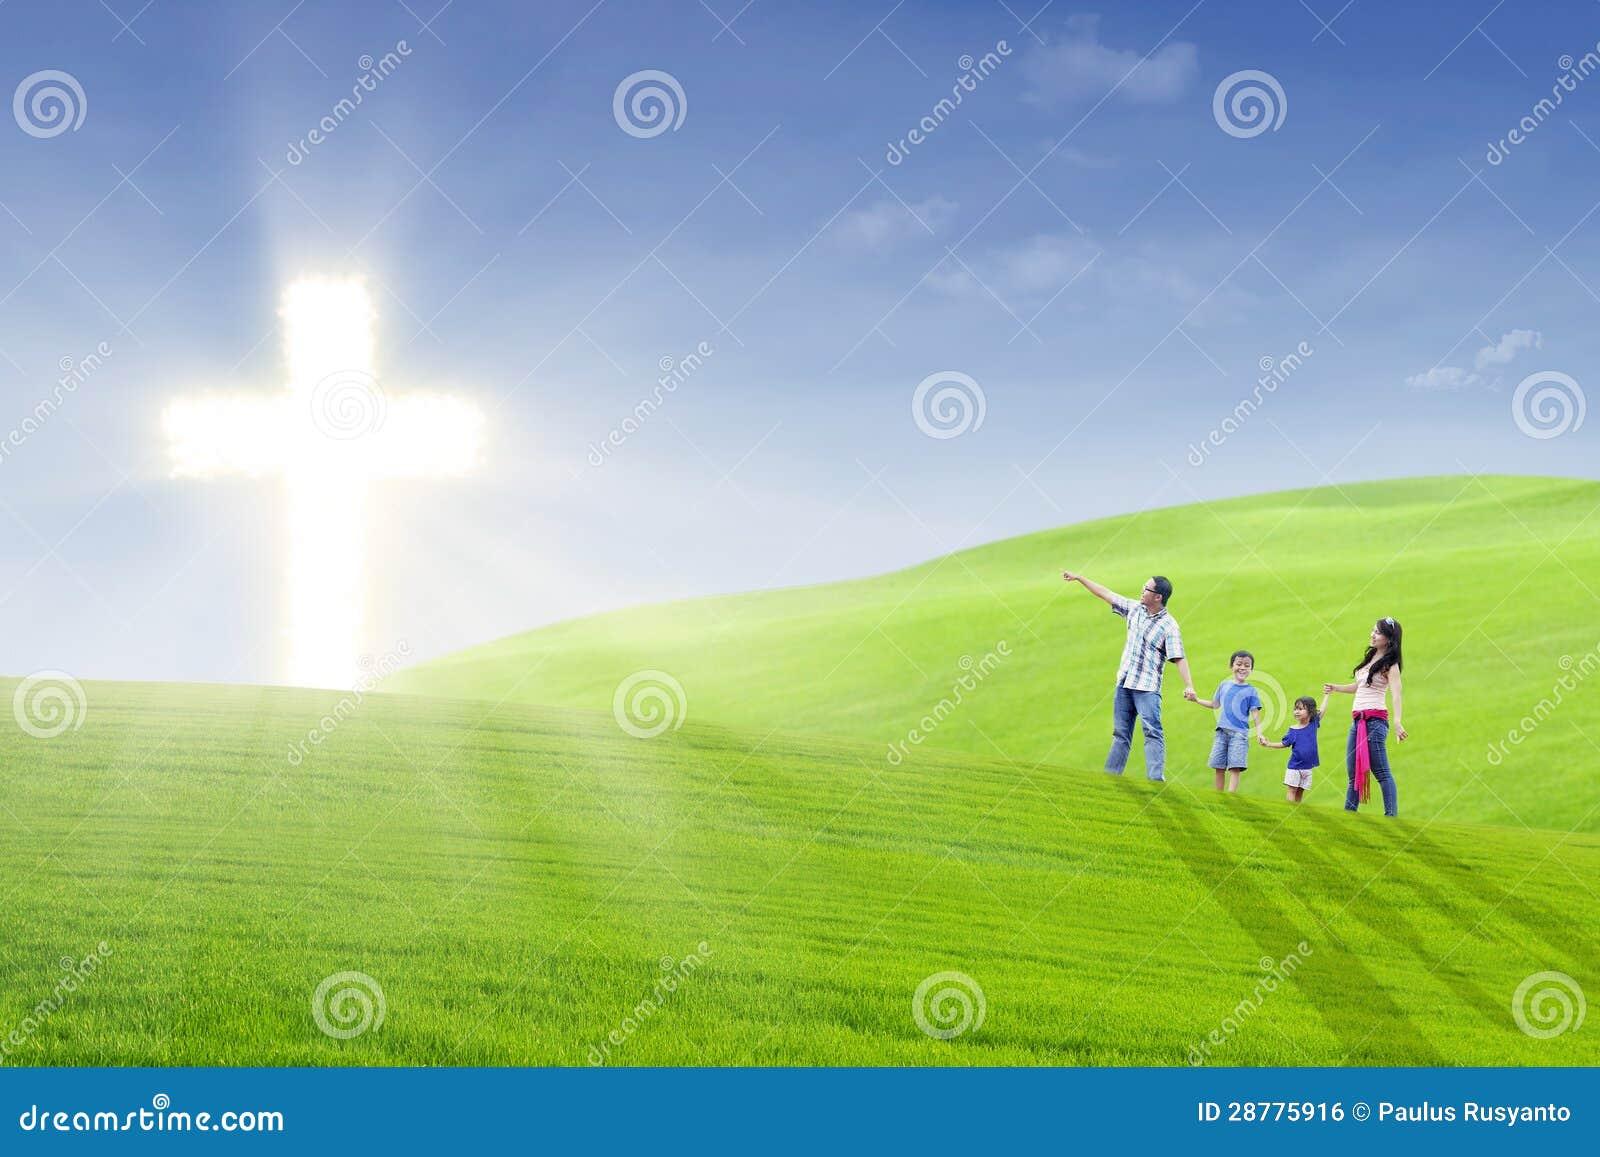 Den kristna familjen går in mot det ljust